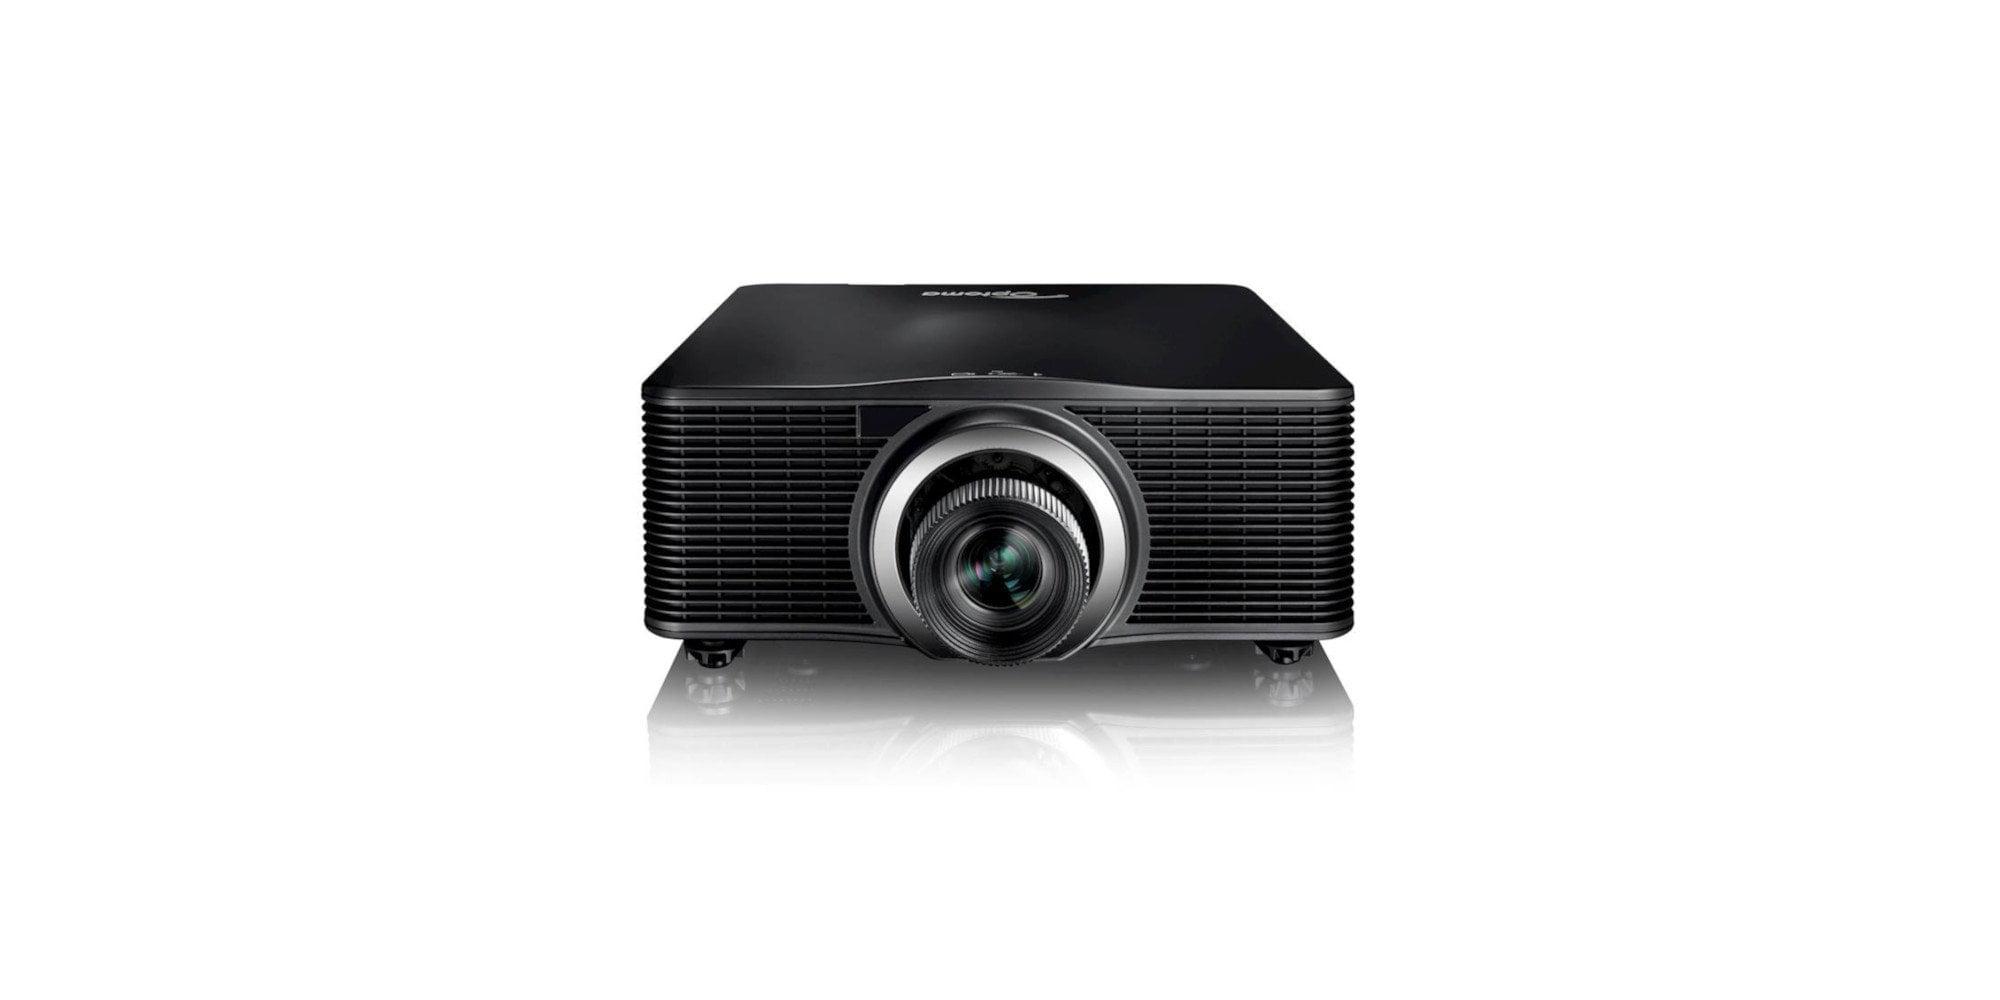 Optoma ZU750 projector